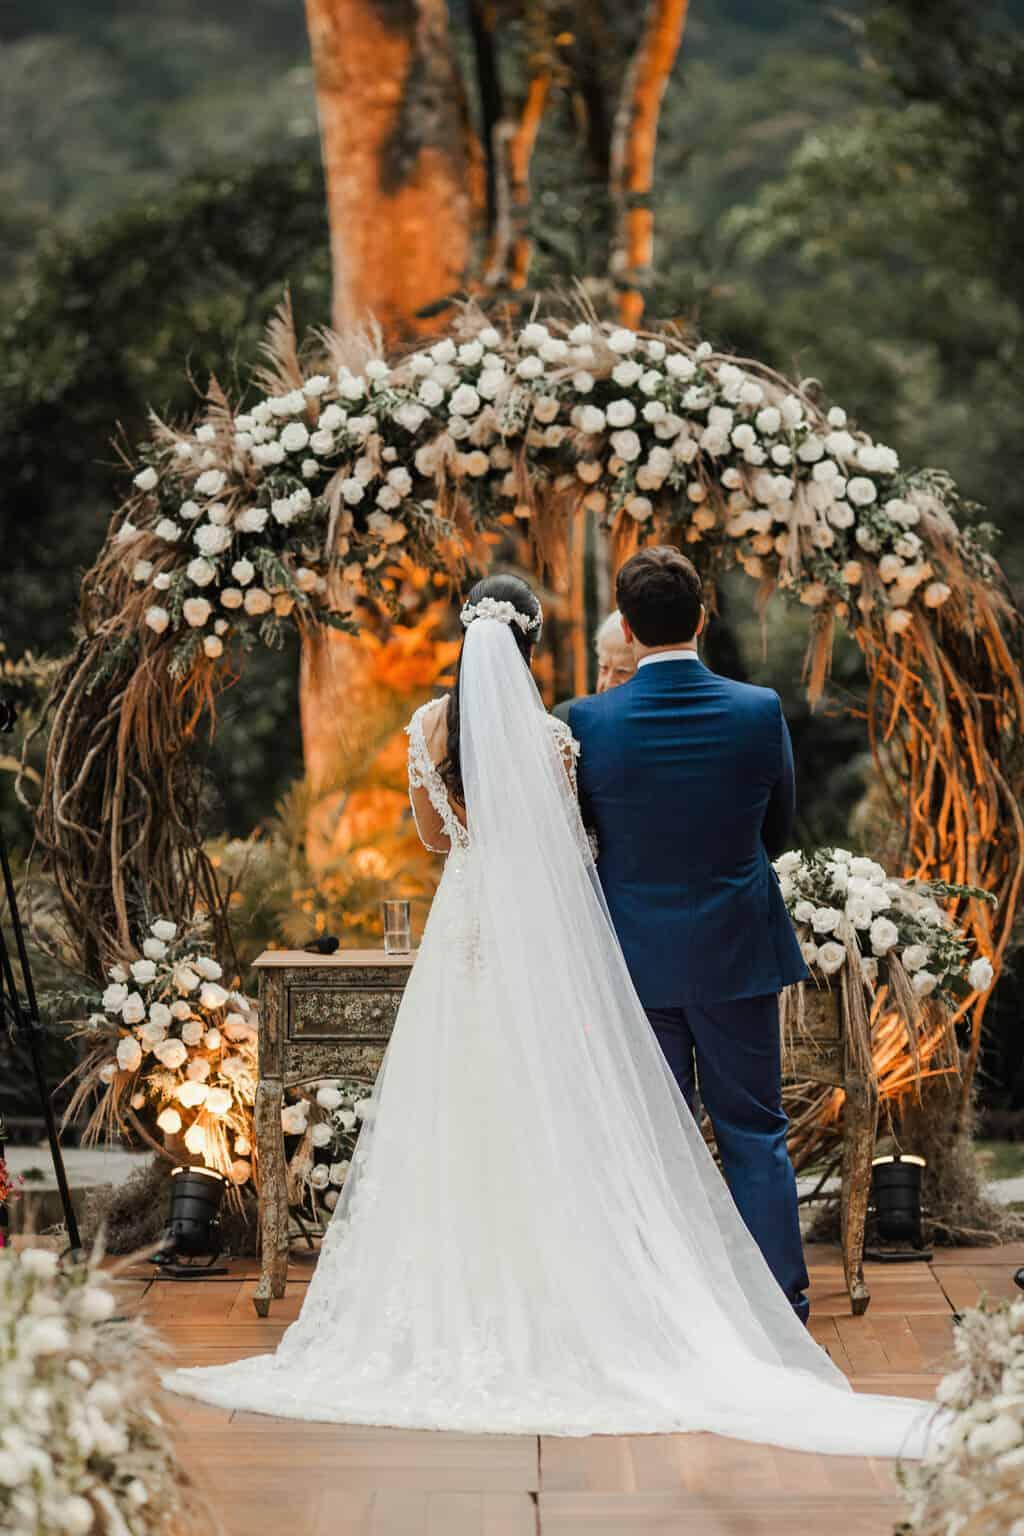 casamento-Beatriz-e-Joao-Fernando-cerimonia-ao-ar-livre-Itaipava-Locanda-Della-Mimosa-Thienny-Tammis147